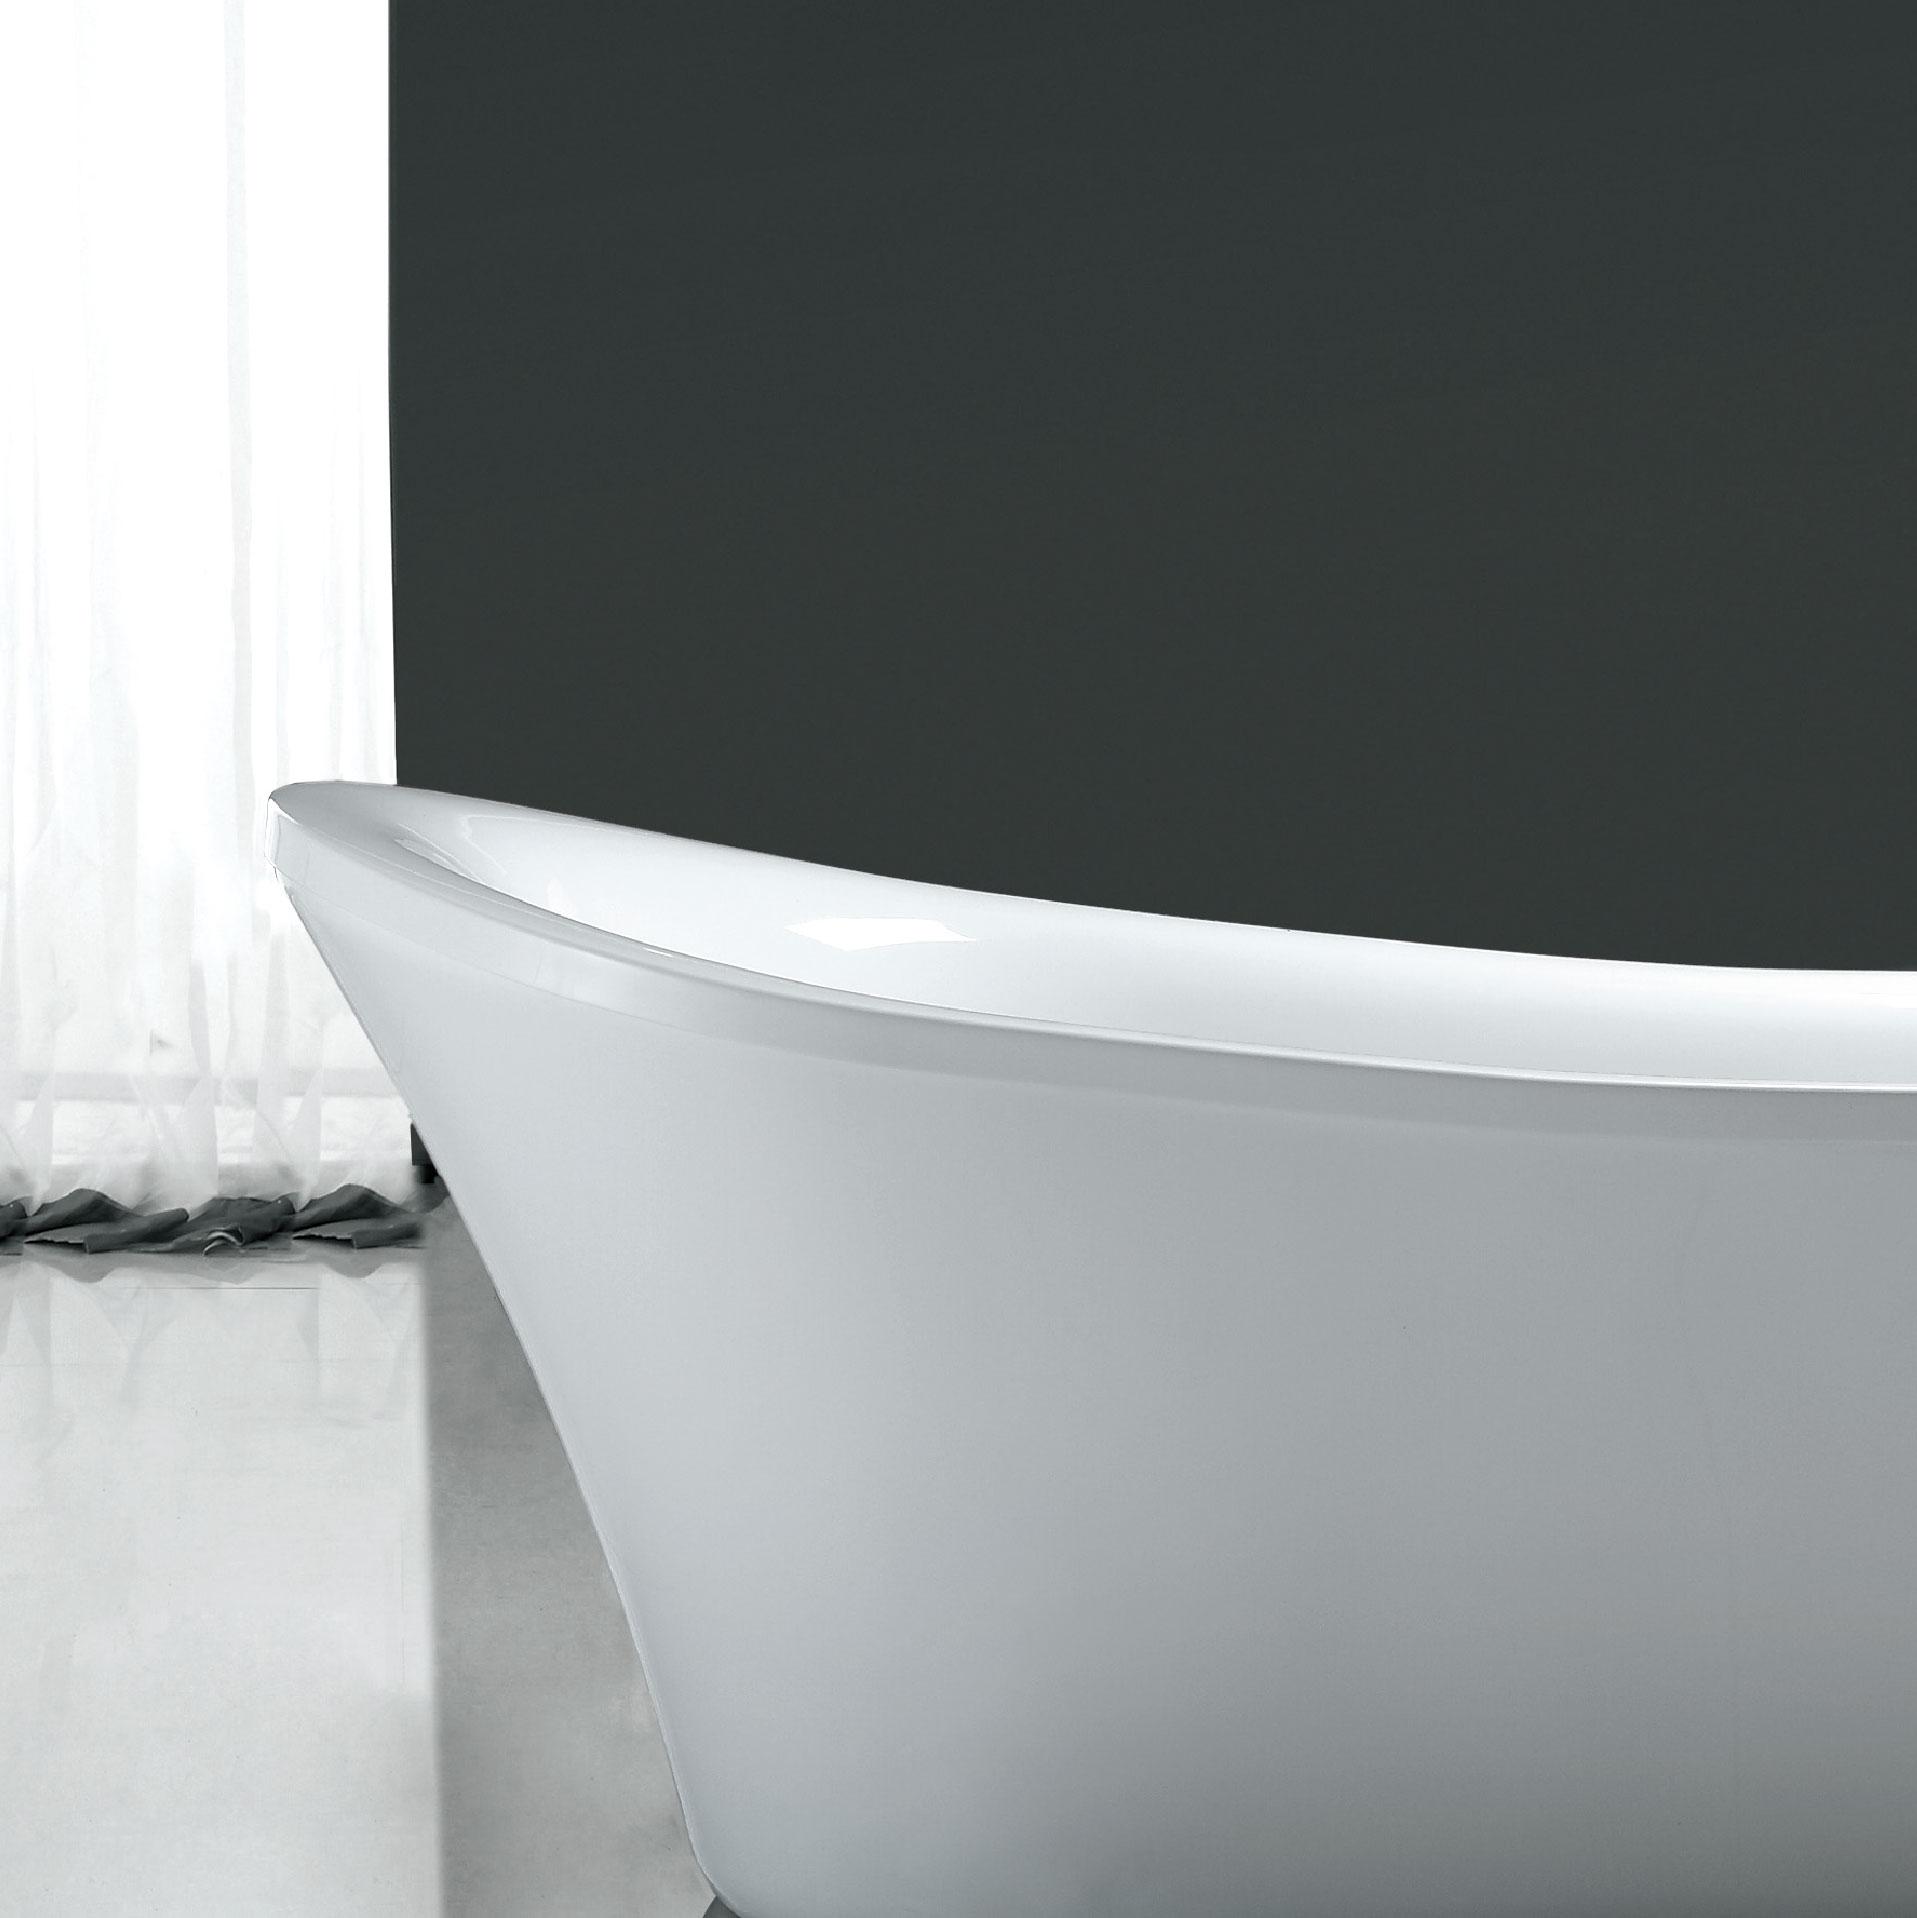 Ove Decors Rachel 5 8 Ft Reversible Drain Bathtub In